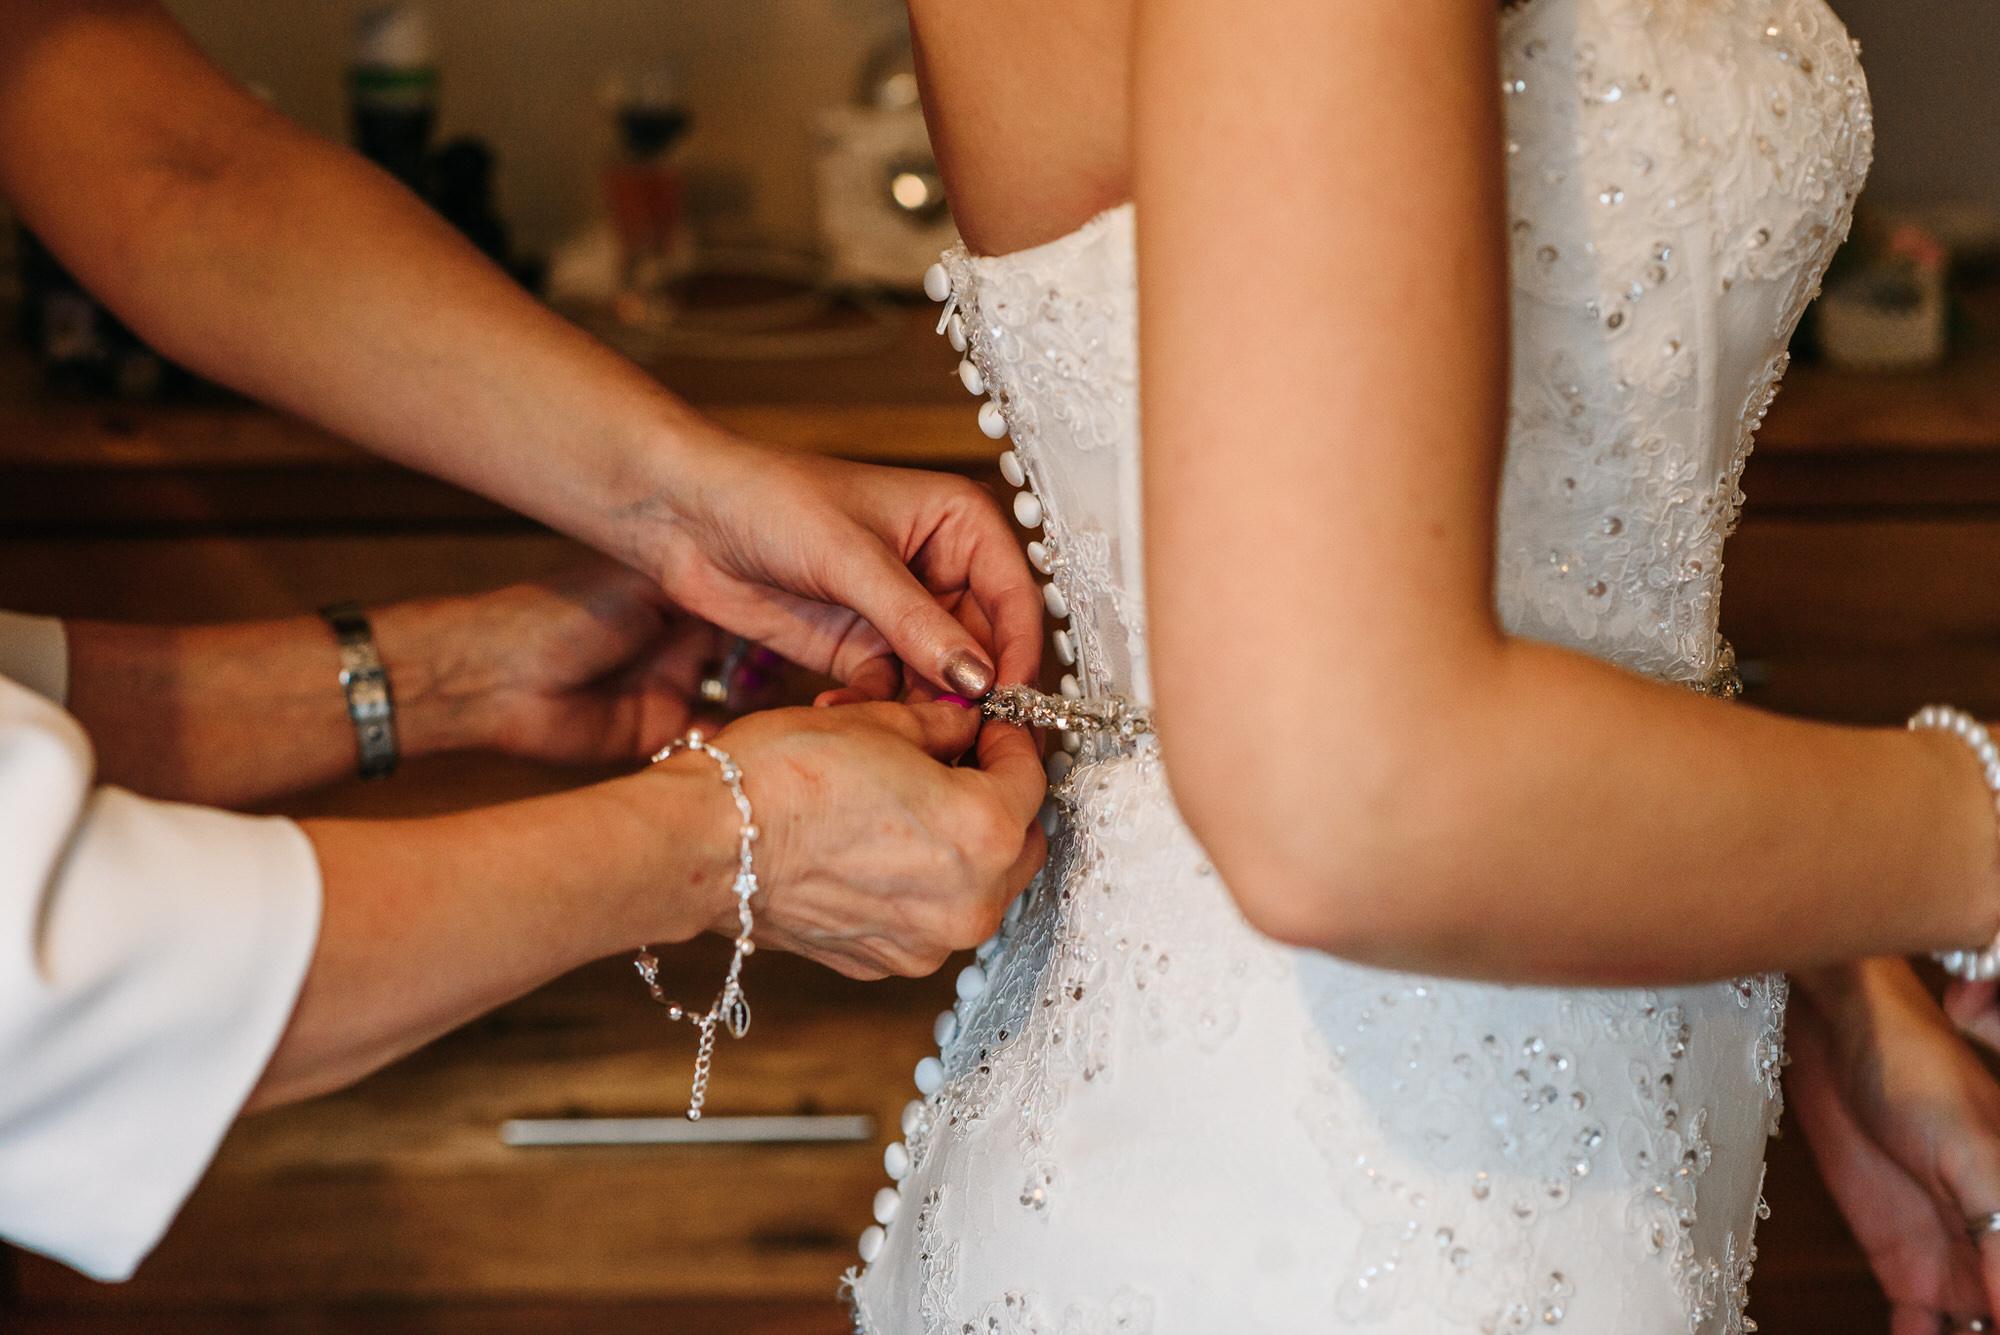 Best Of Yorkshire Wedding Photography 2017 - Martyn Hand-80.jpg